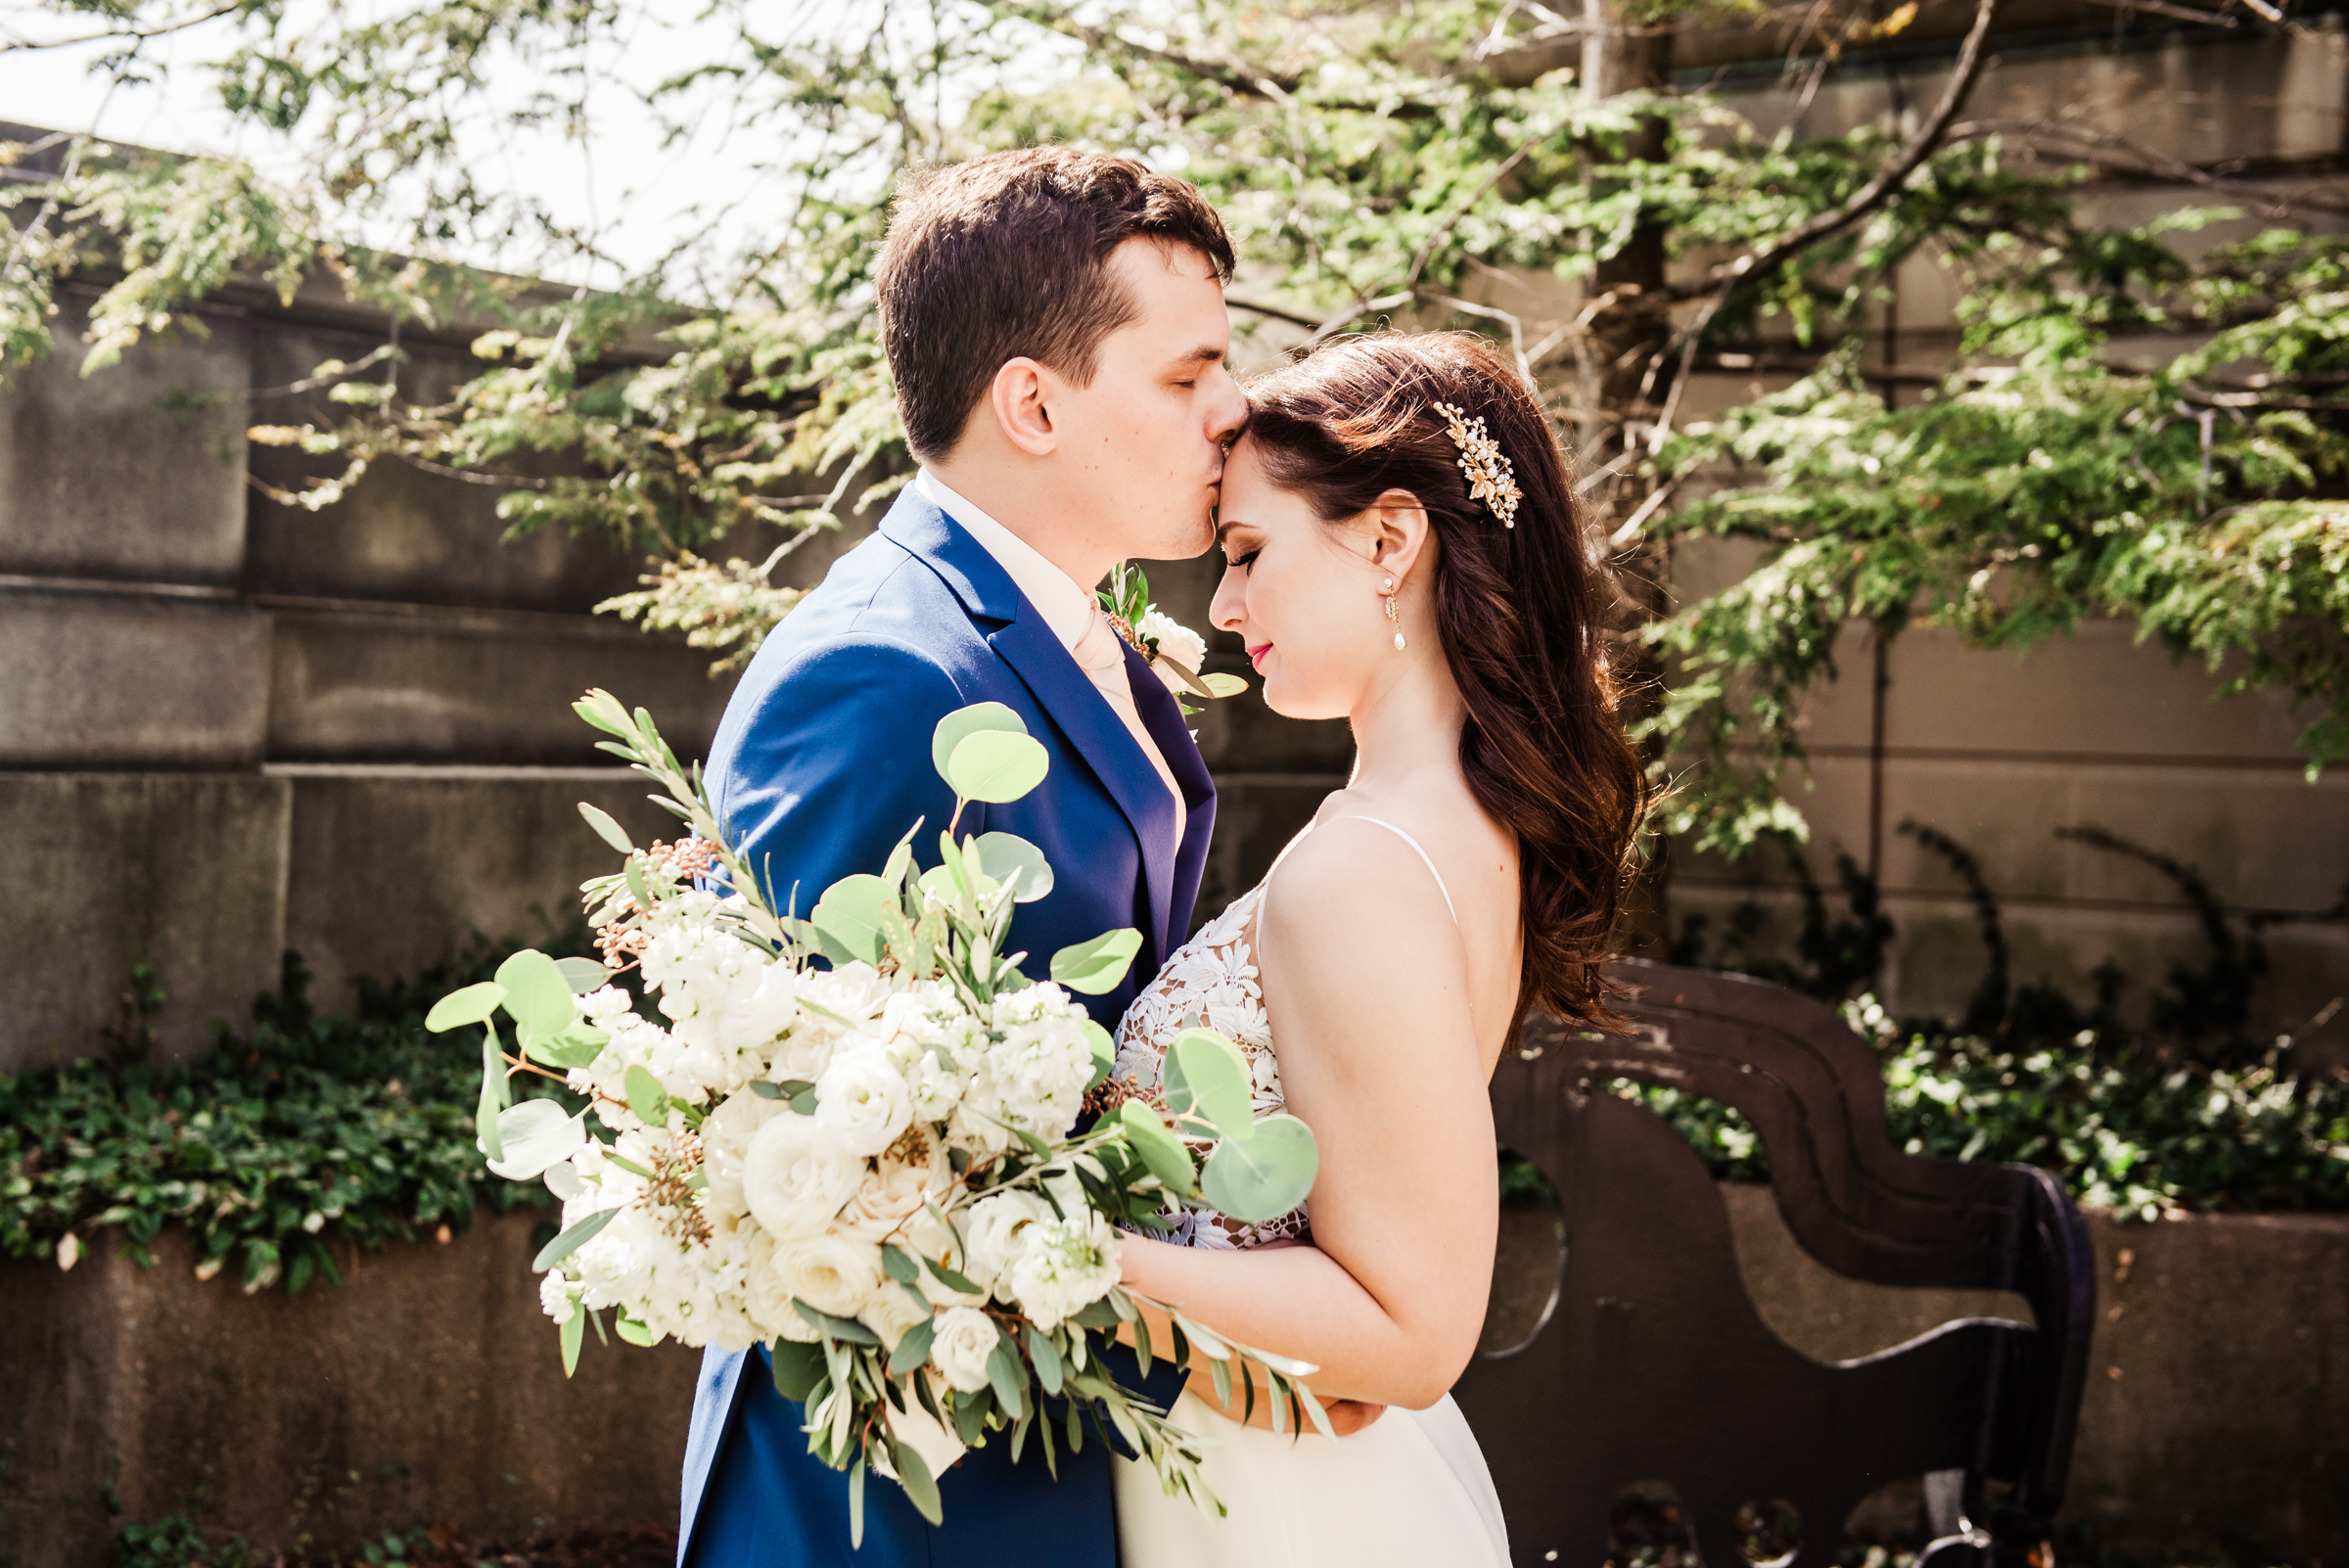 The_Arbor_LoftRochester_Wedding_JILL_STUDIO_Rochester_NY_Photographer_144751.jpg